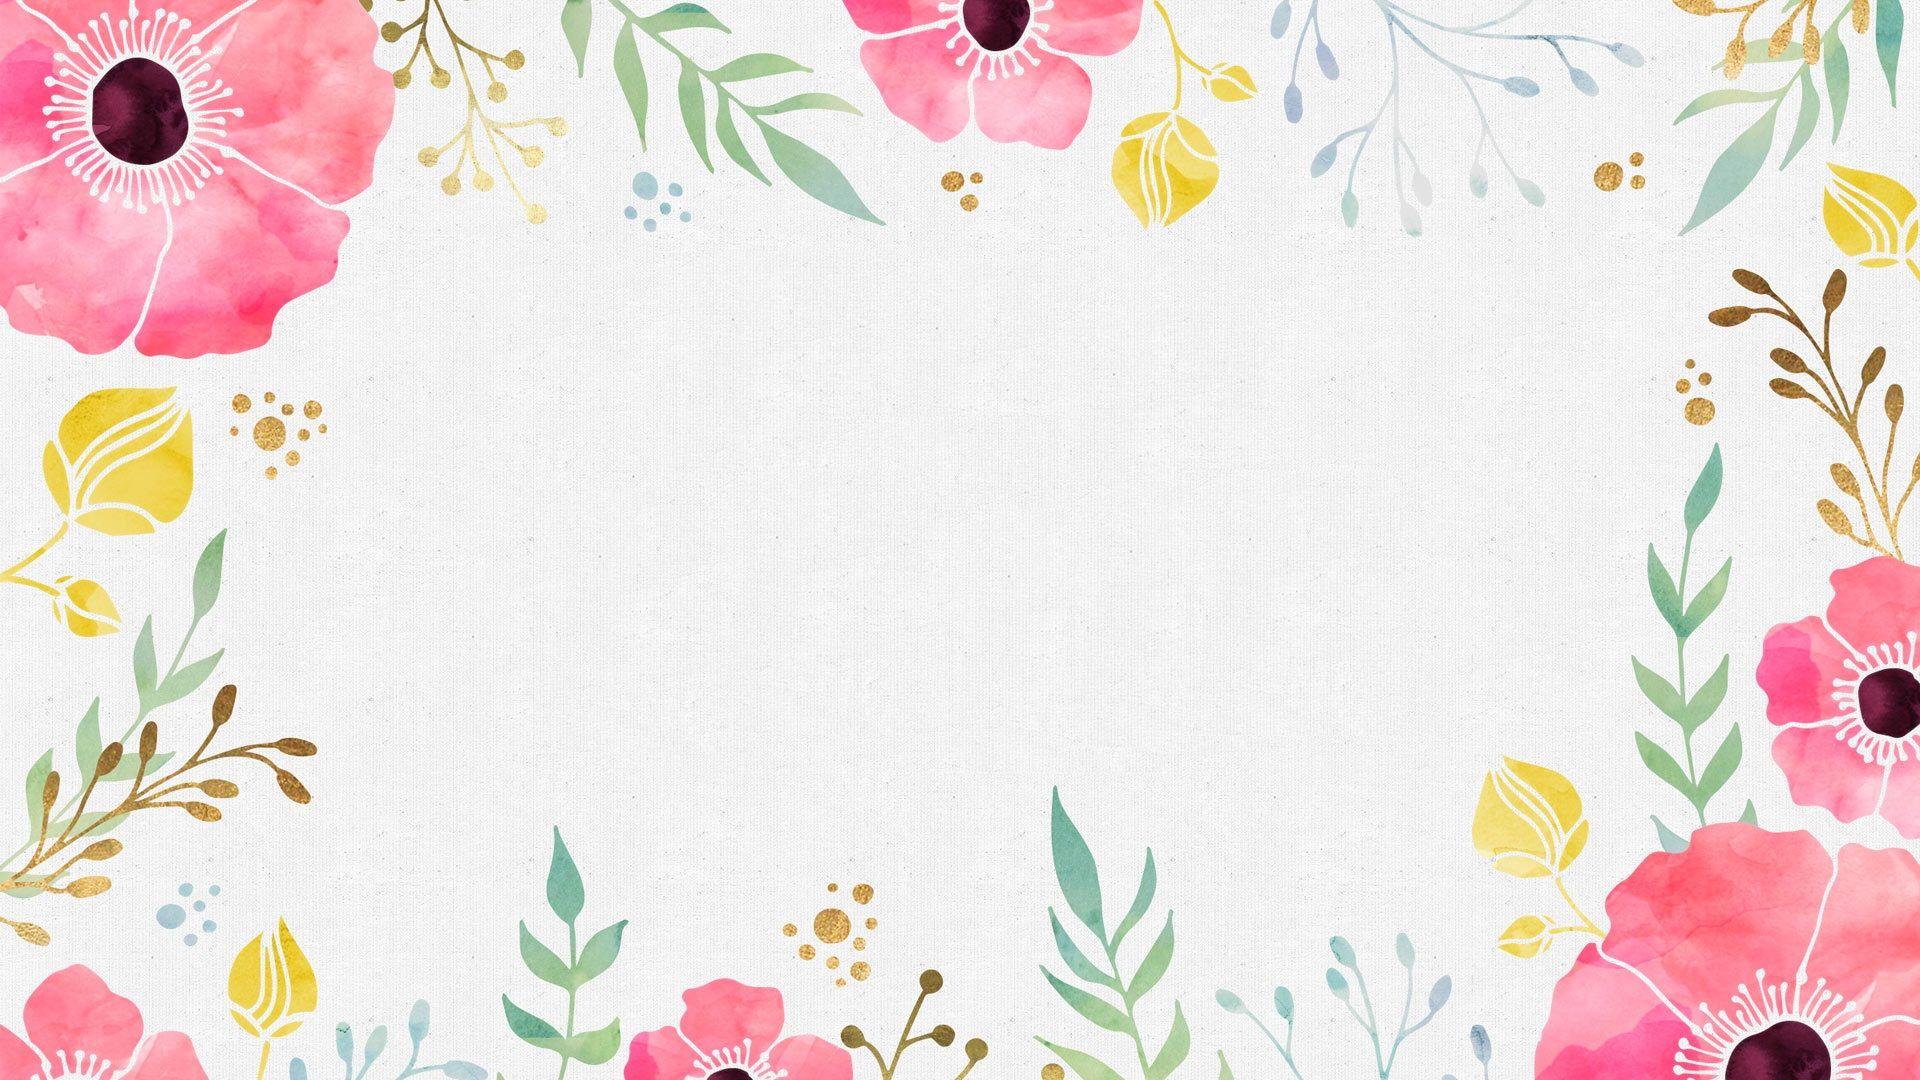 Flower Hd Wallpaper Background Image 1920x1080 Id 1037917